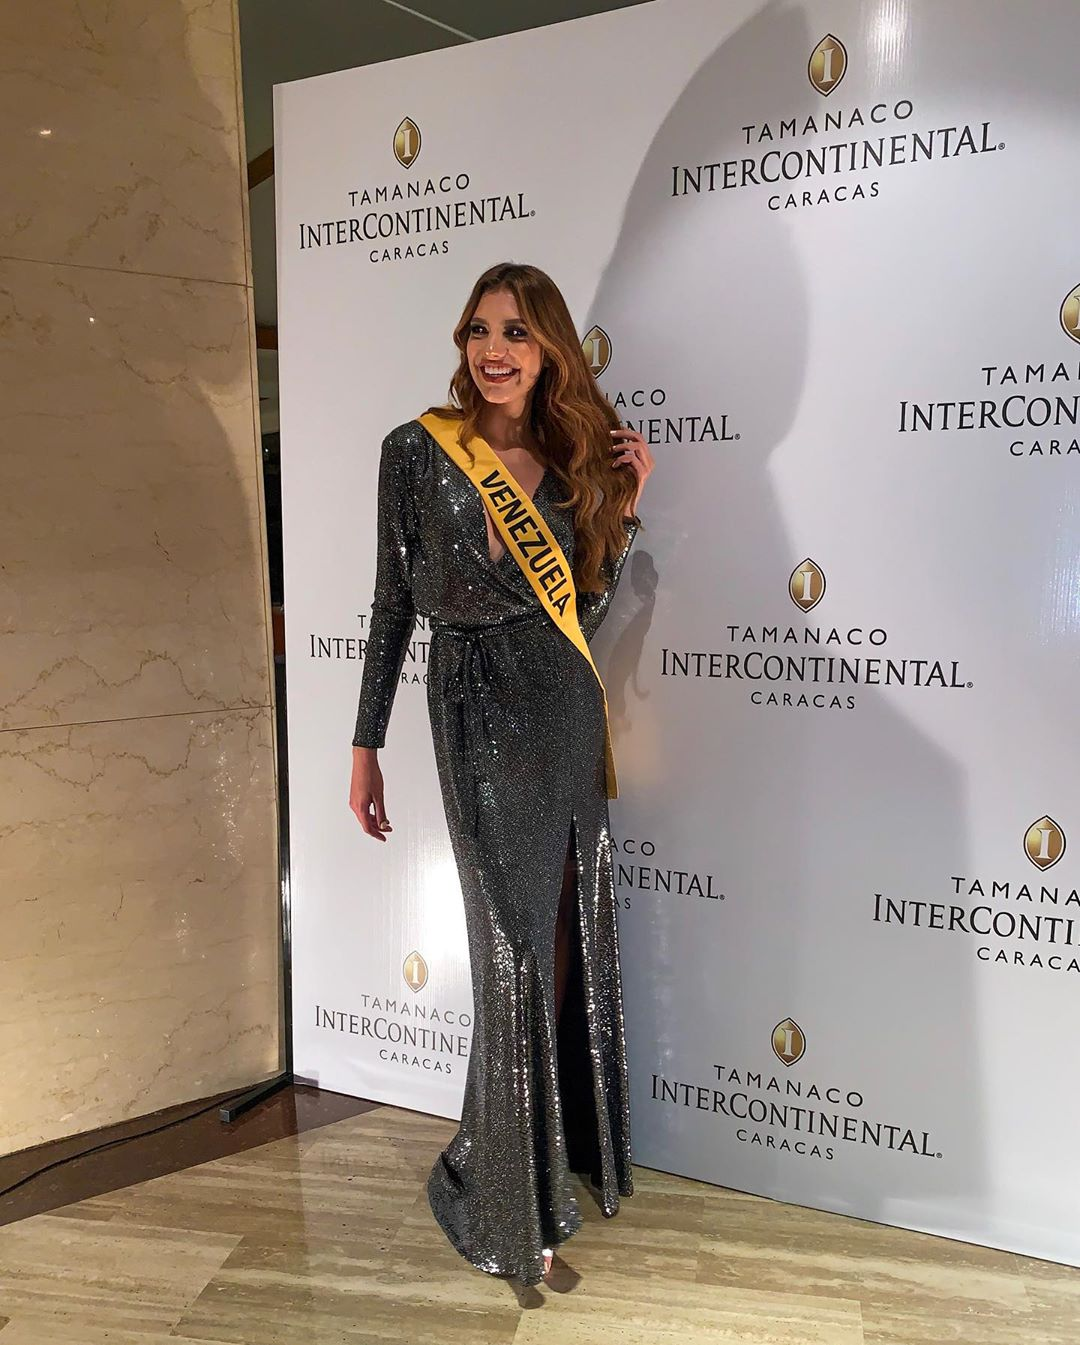 lourdes valentina figuera, miss grand international 2019. - Página 5 70099210